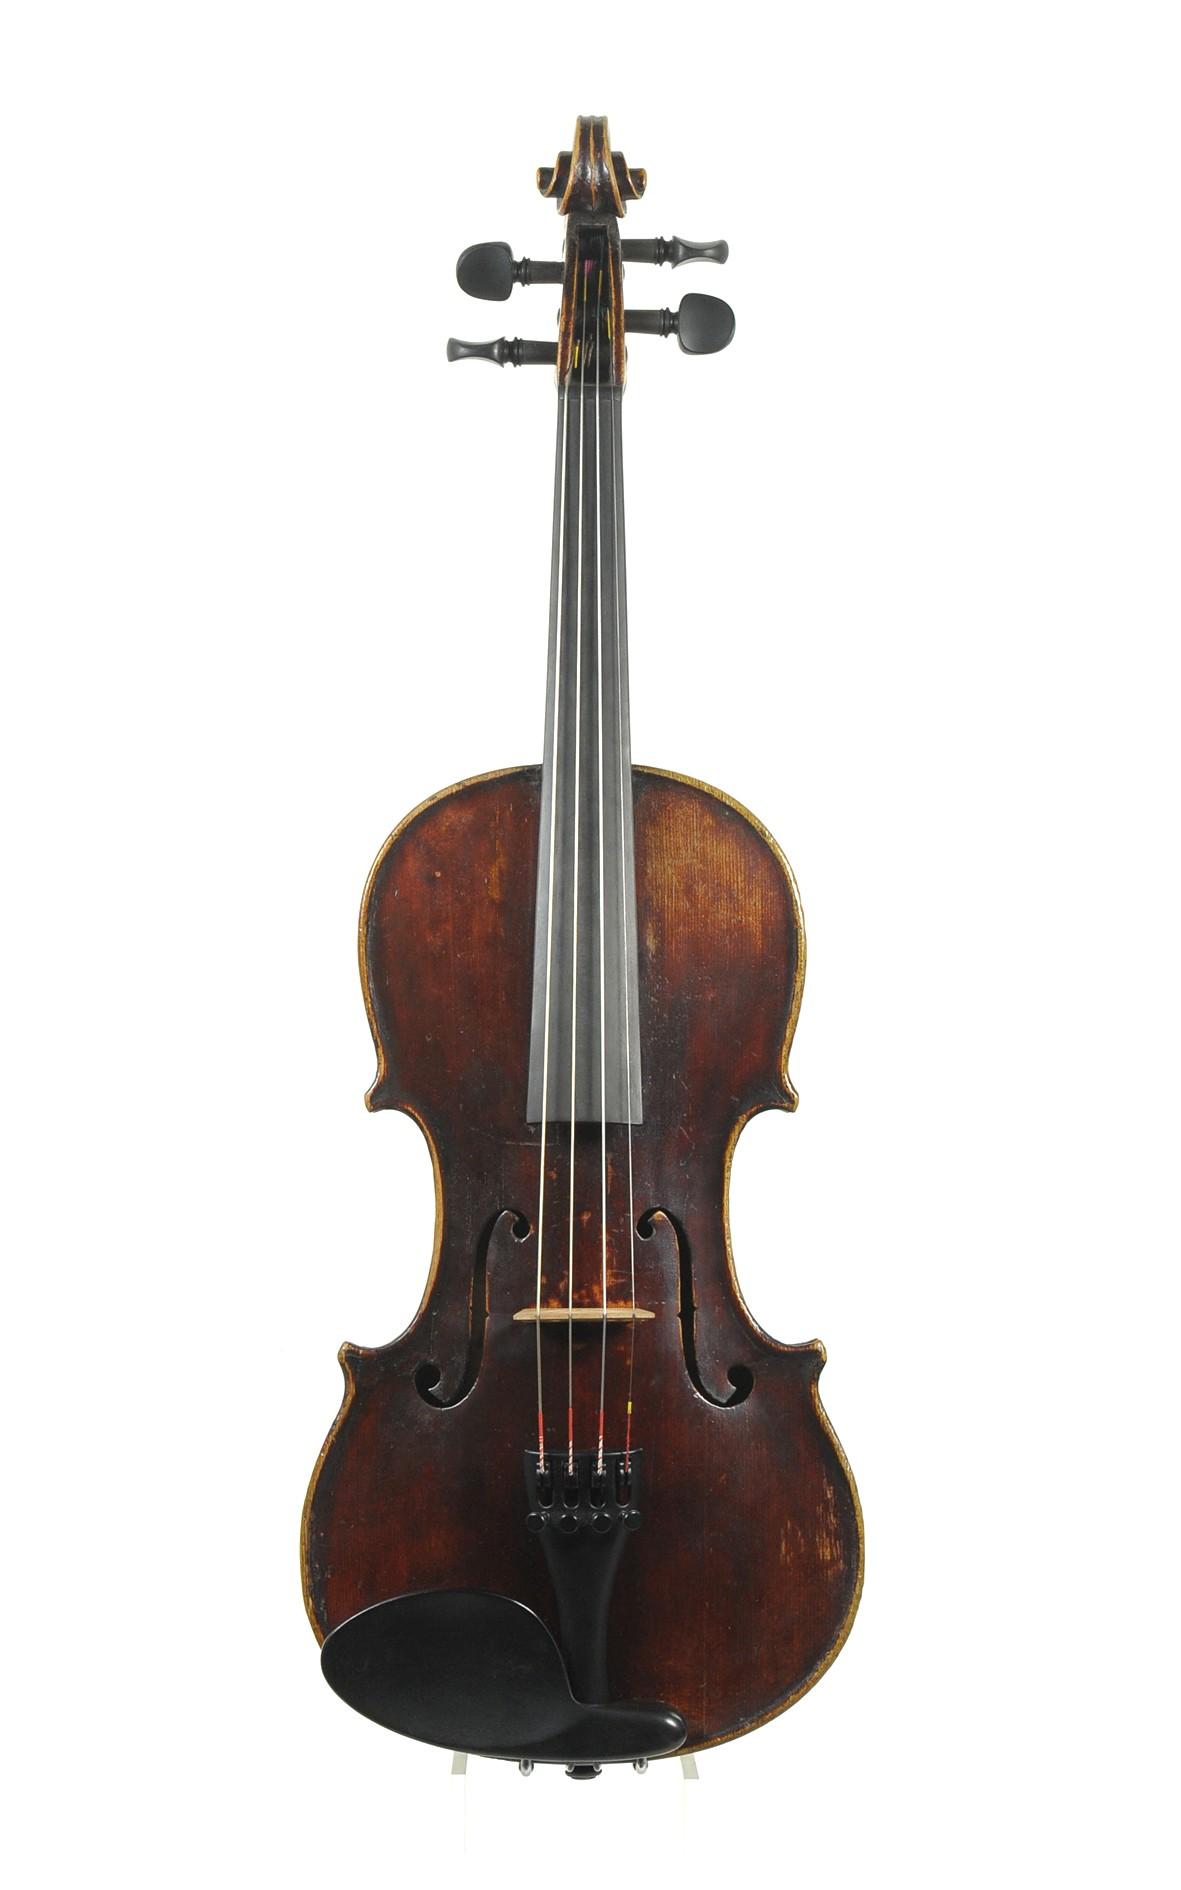 Neuner & Hornsteiner antique 3/4 sized violin ca. 1850 - top